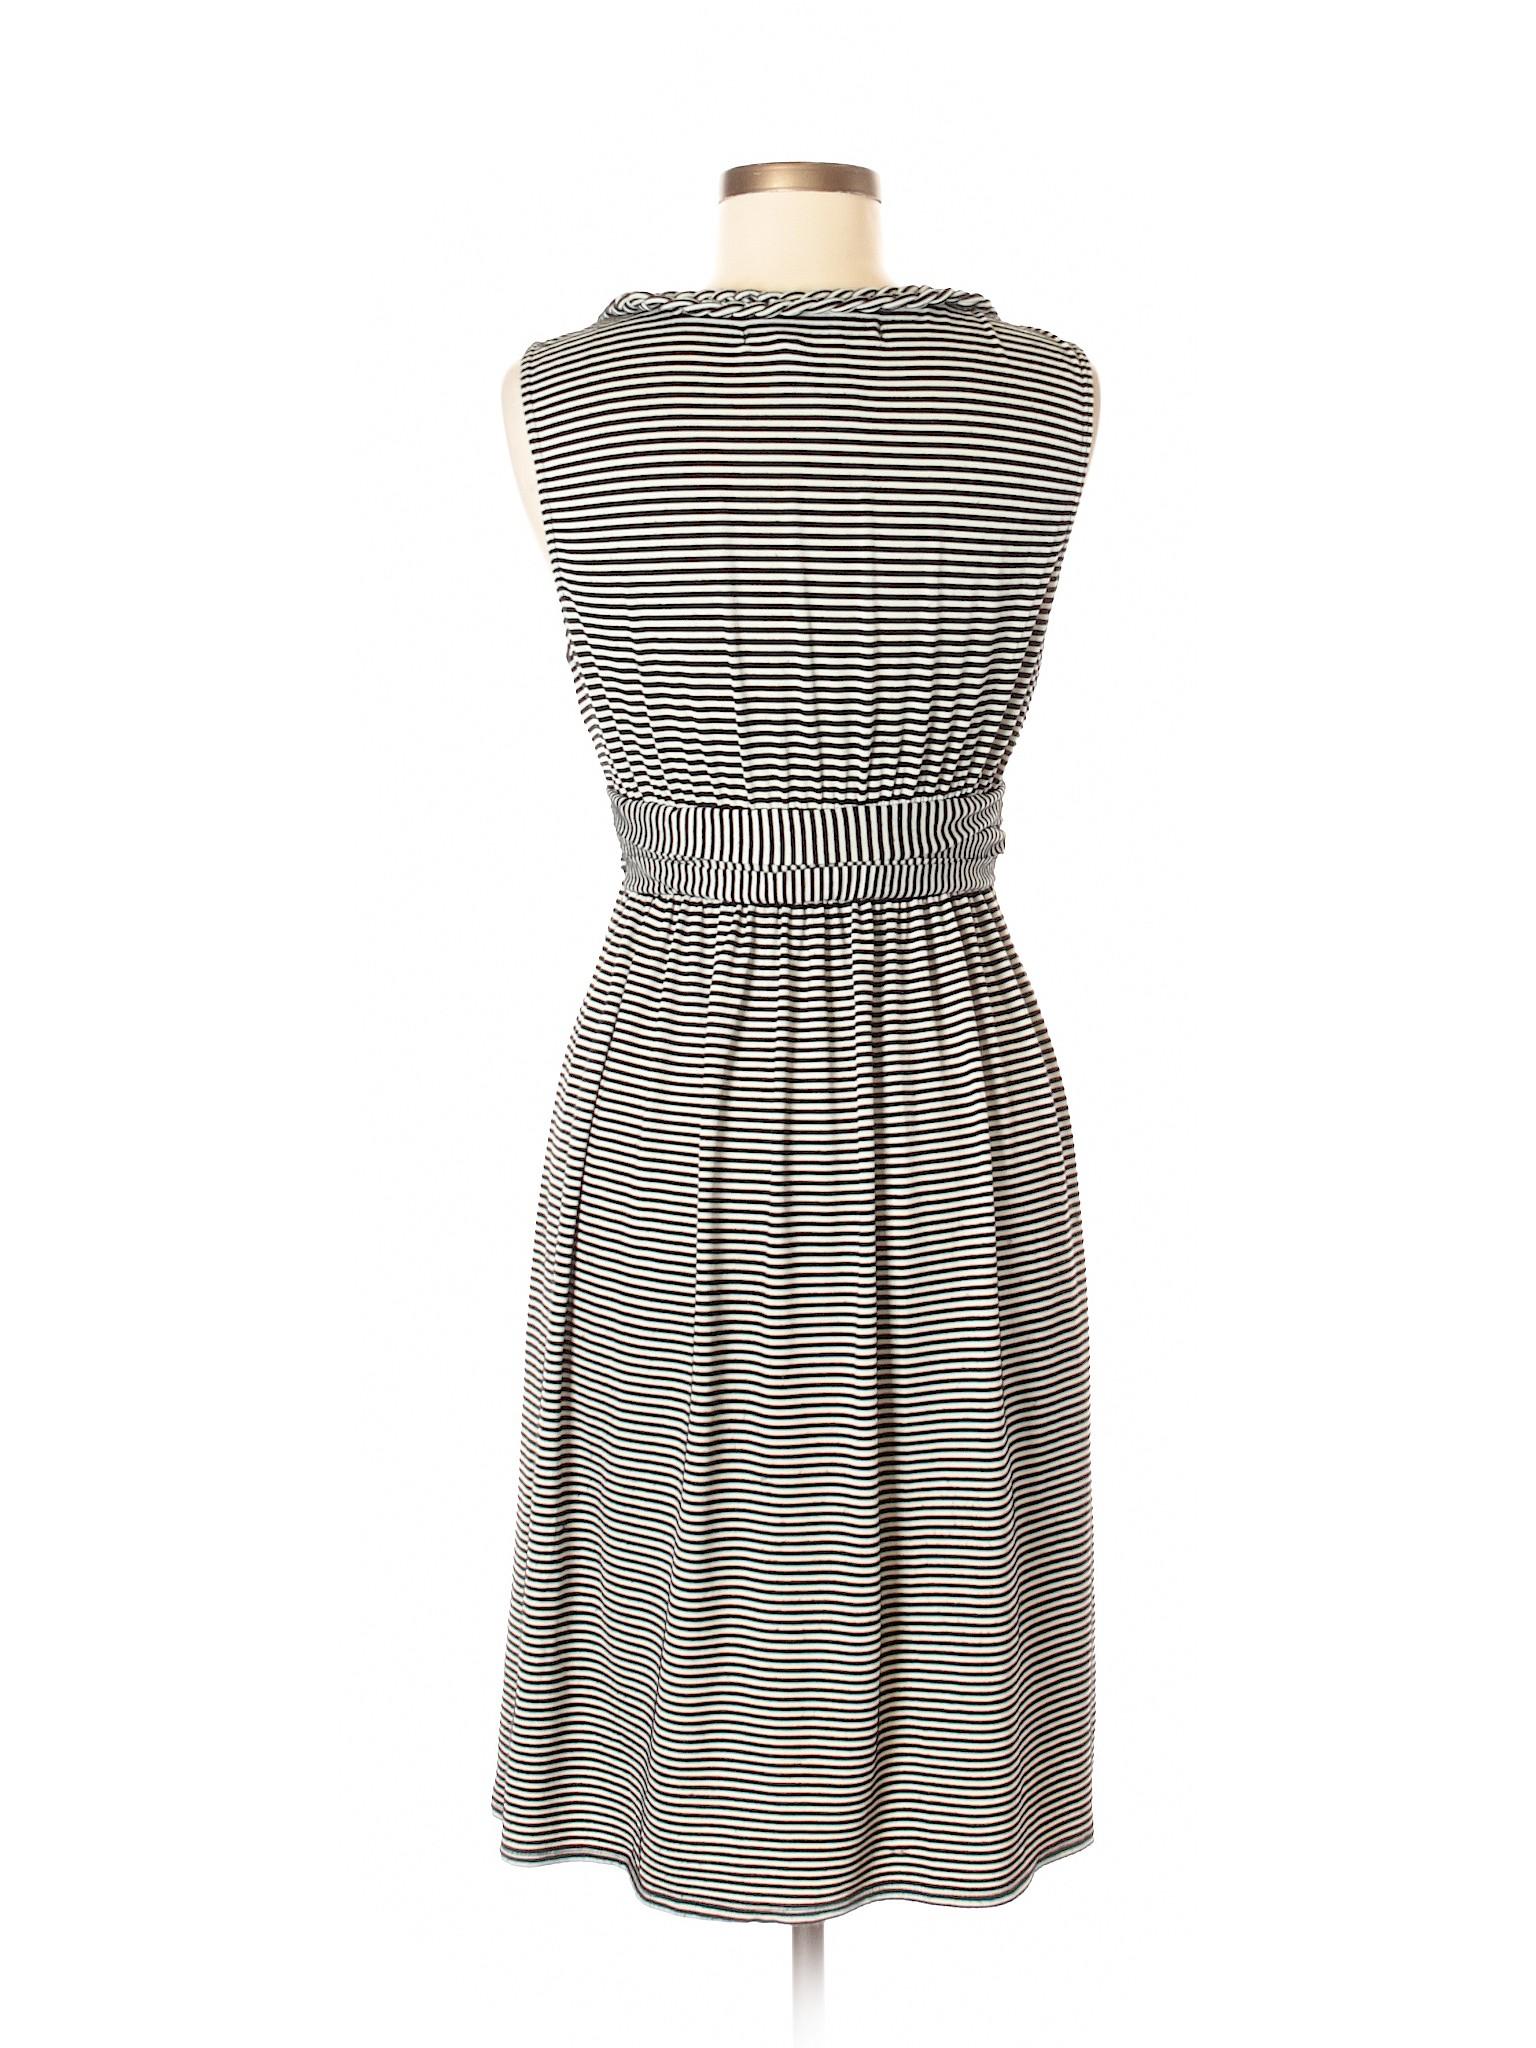 Dress winter Casual Boutique Studio Max I7wRxIYX